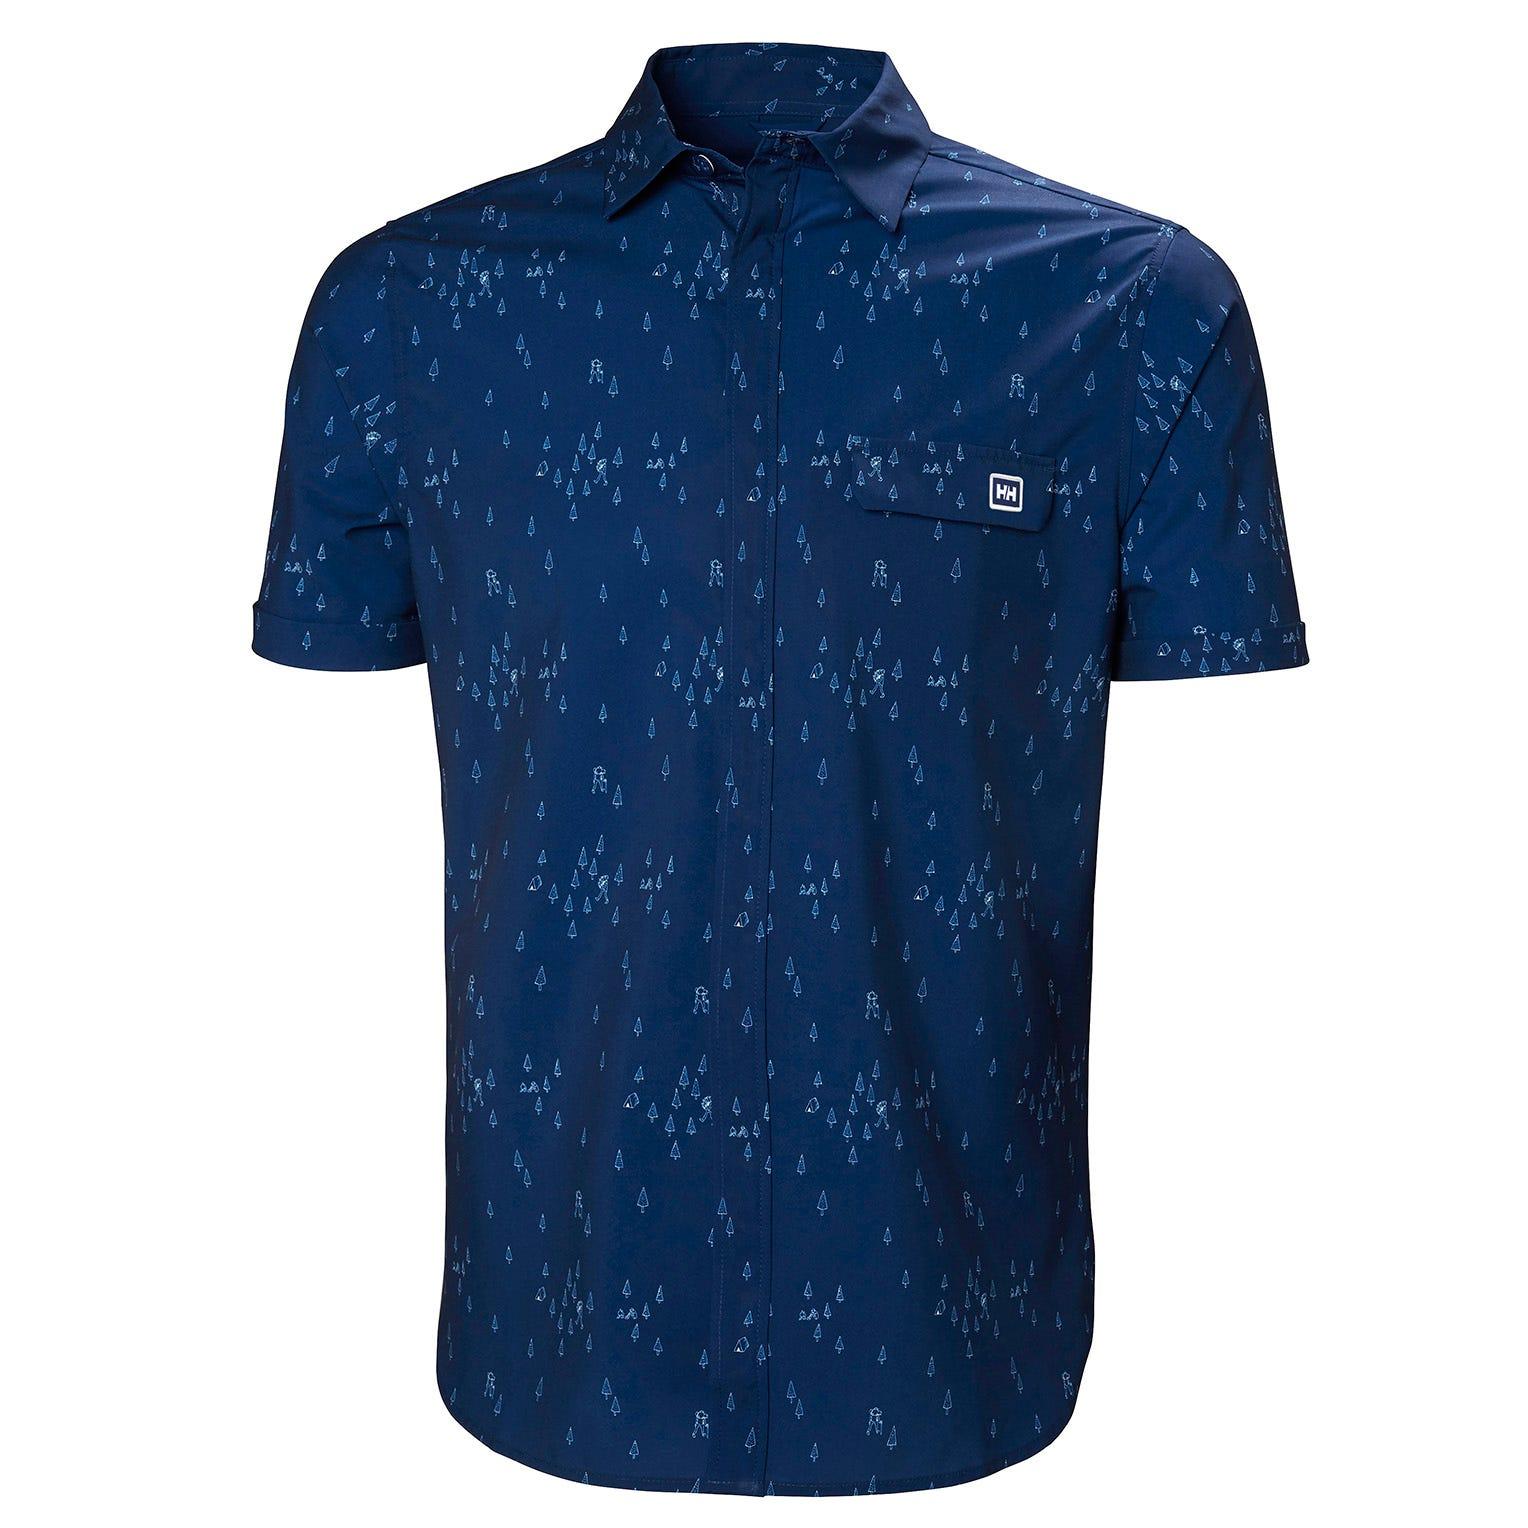 Helly Hansen Oya Shirt Mens Midlayer Blue XXL